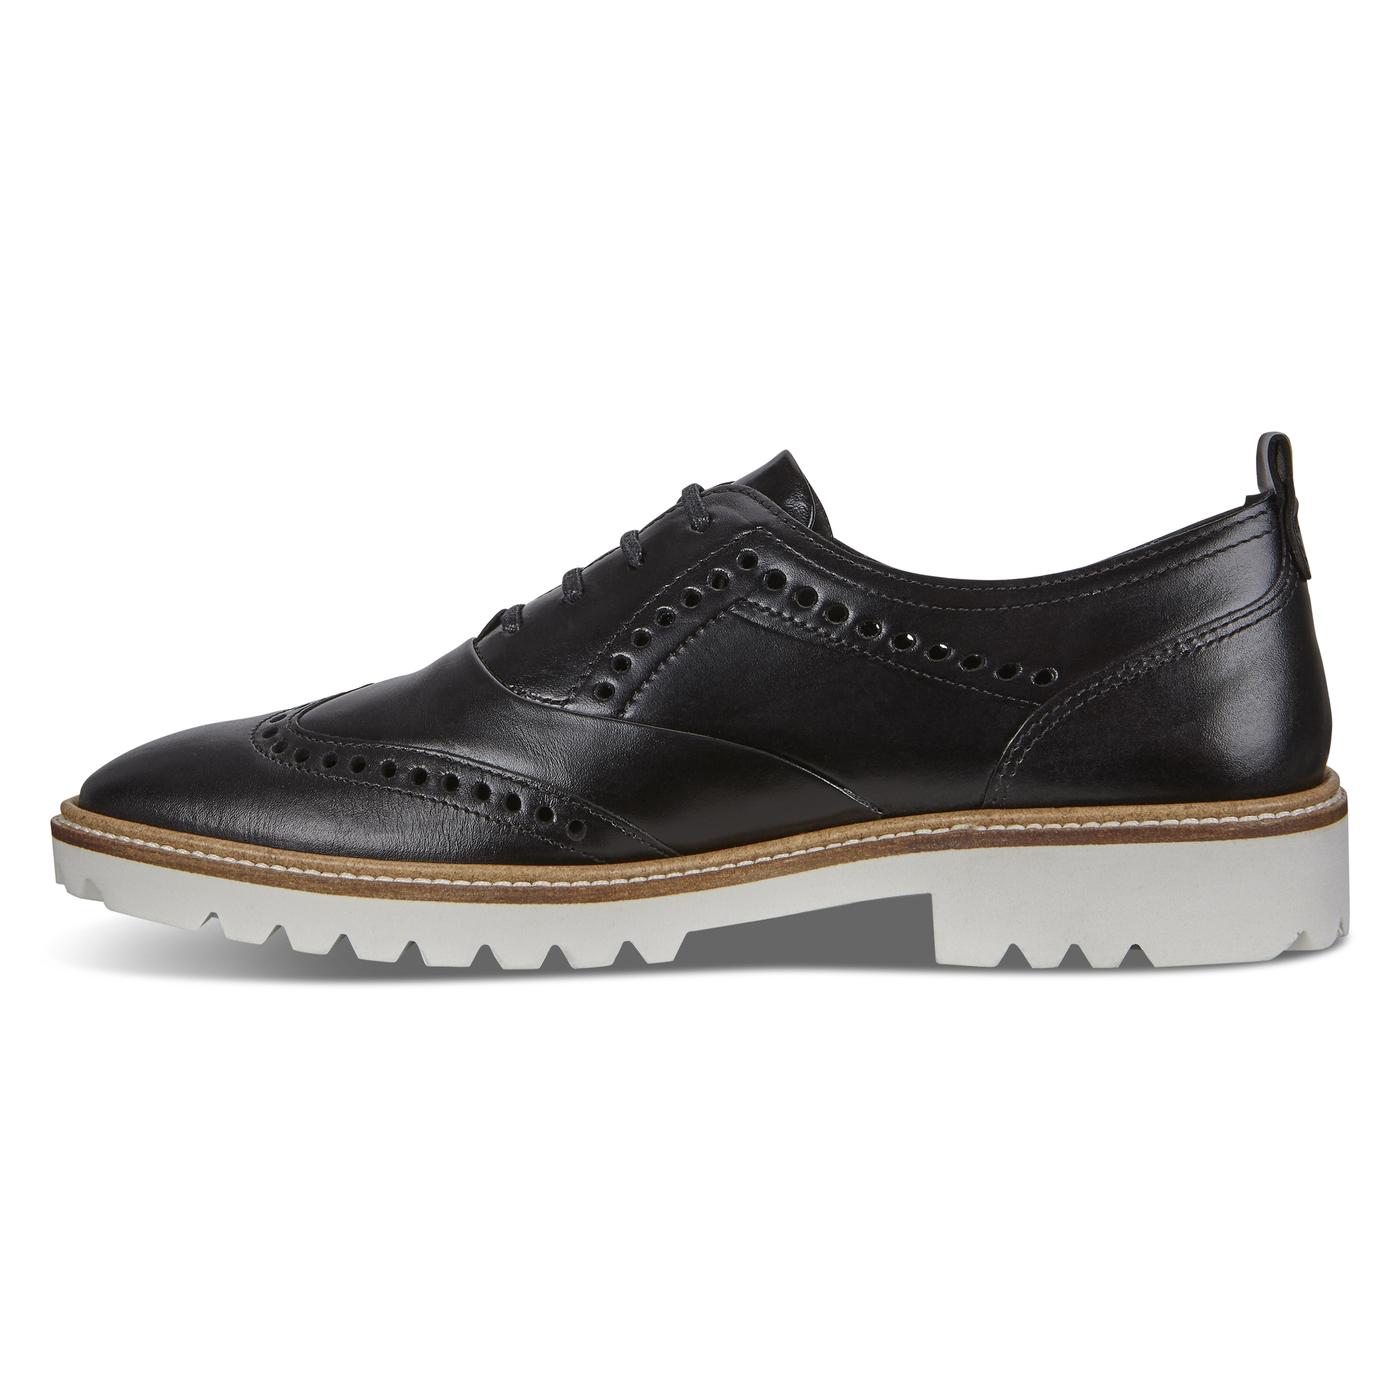 ECCO INCISE TAILORED Shoe